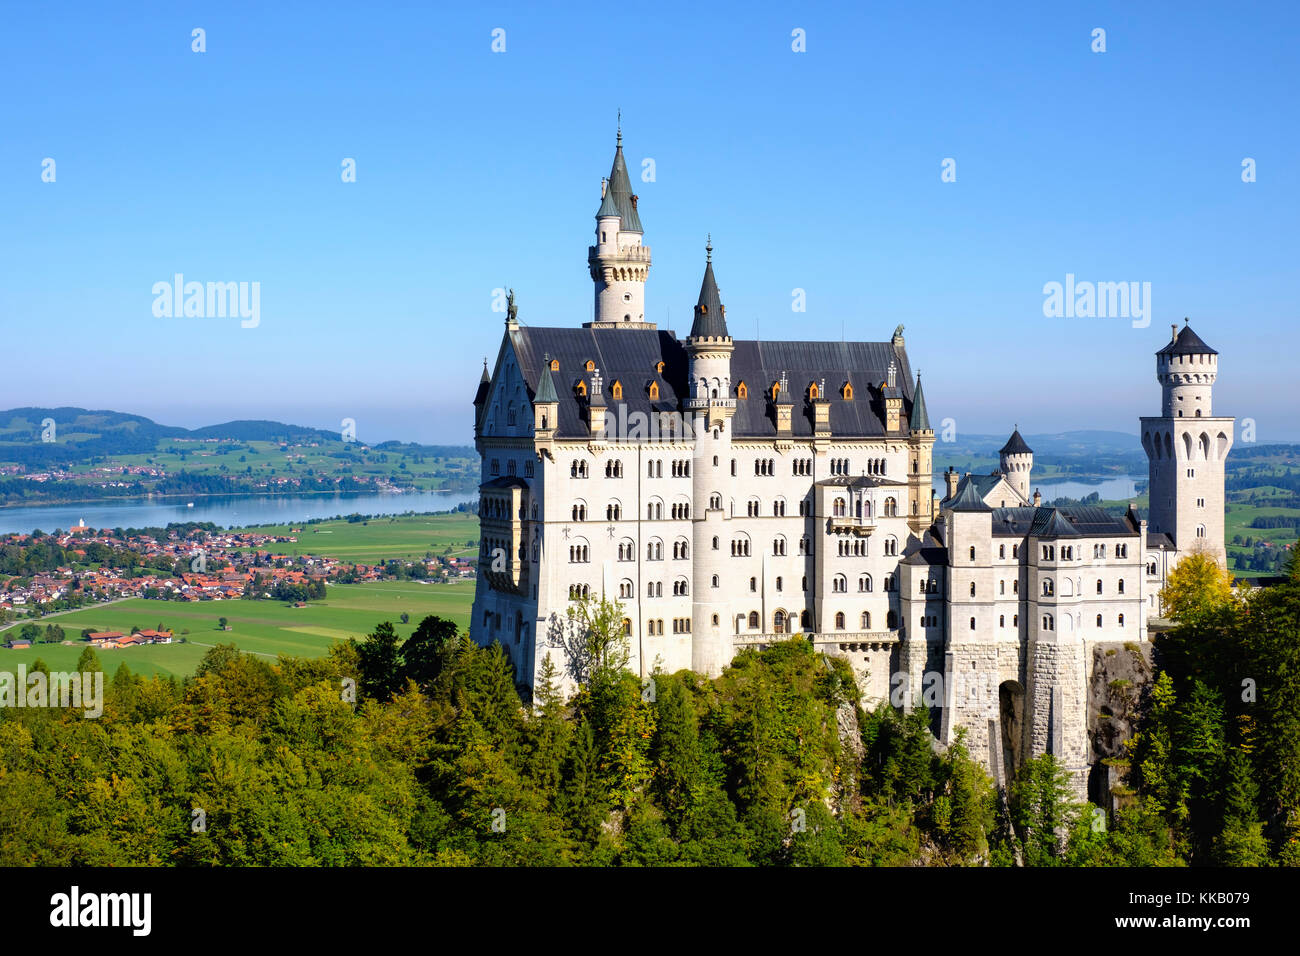 Il castello di Neuschwanstein, nel retro forggensee, Schwangau, königswinkel, ostallgäu, Algovia, Svevia, Immagini Stock